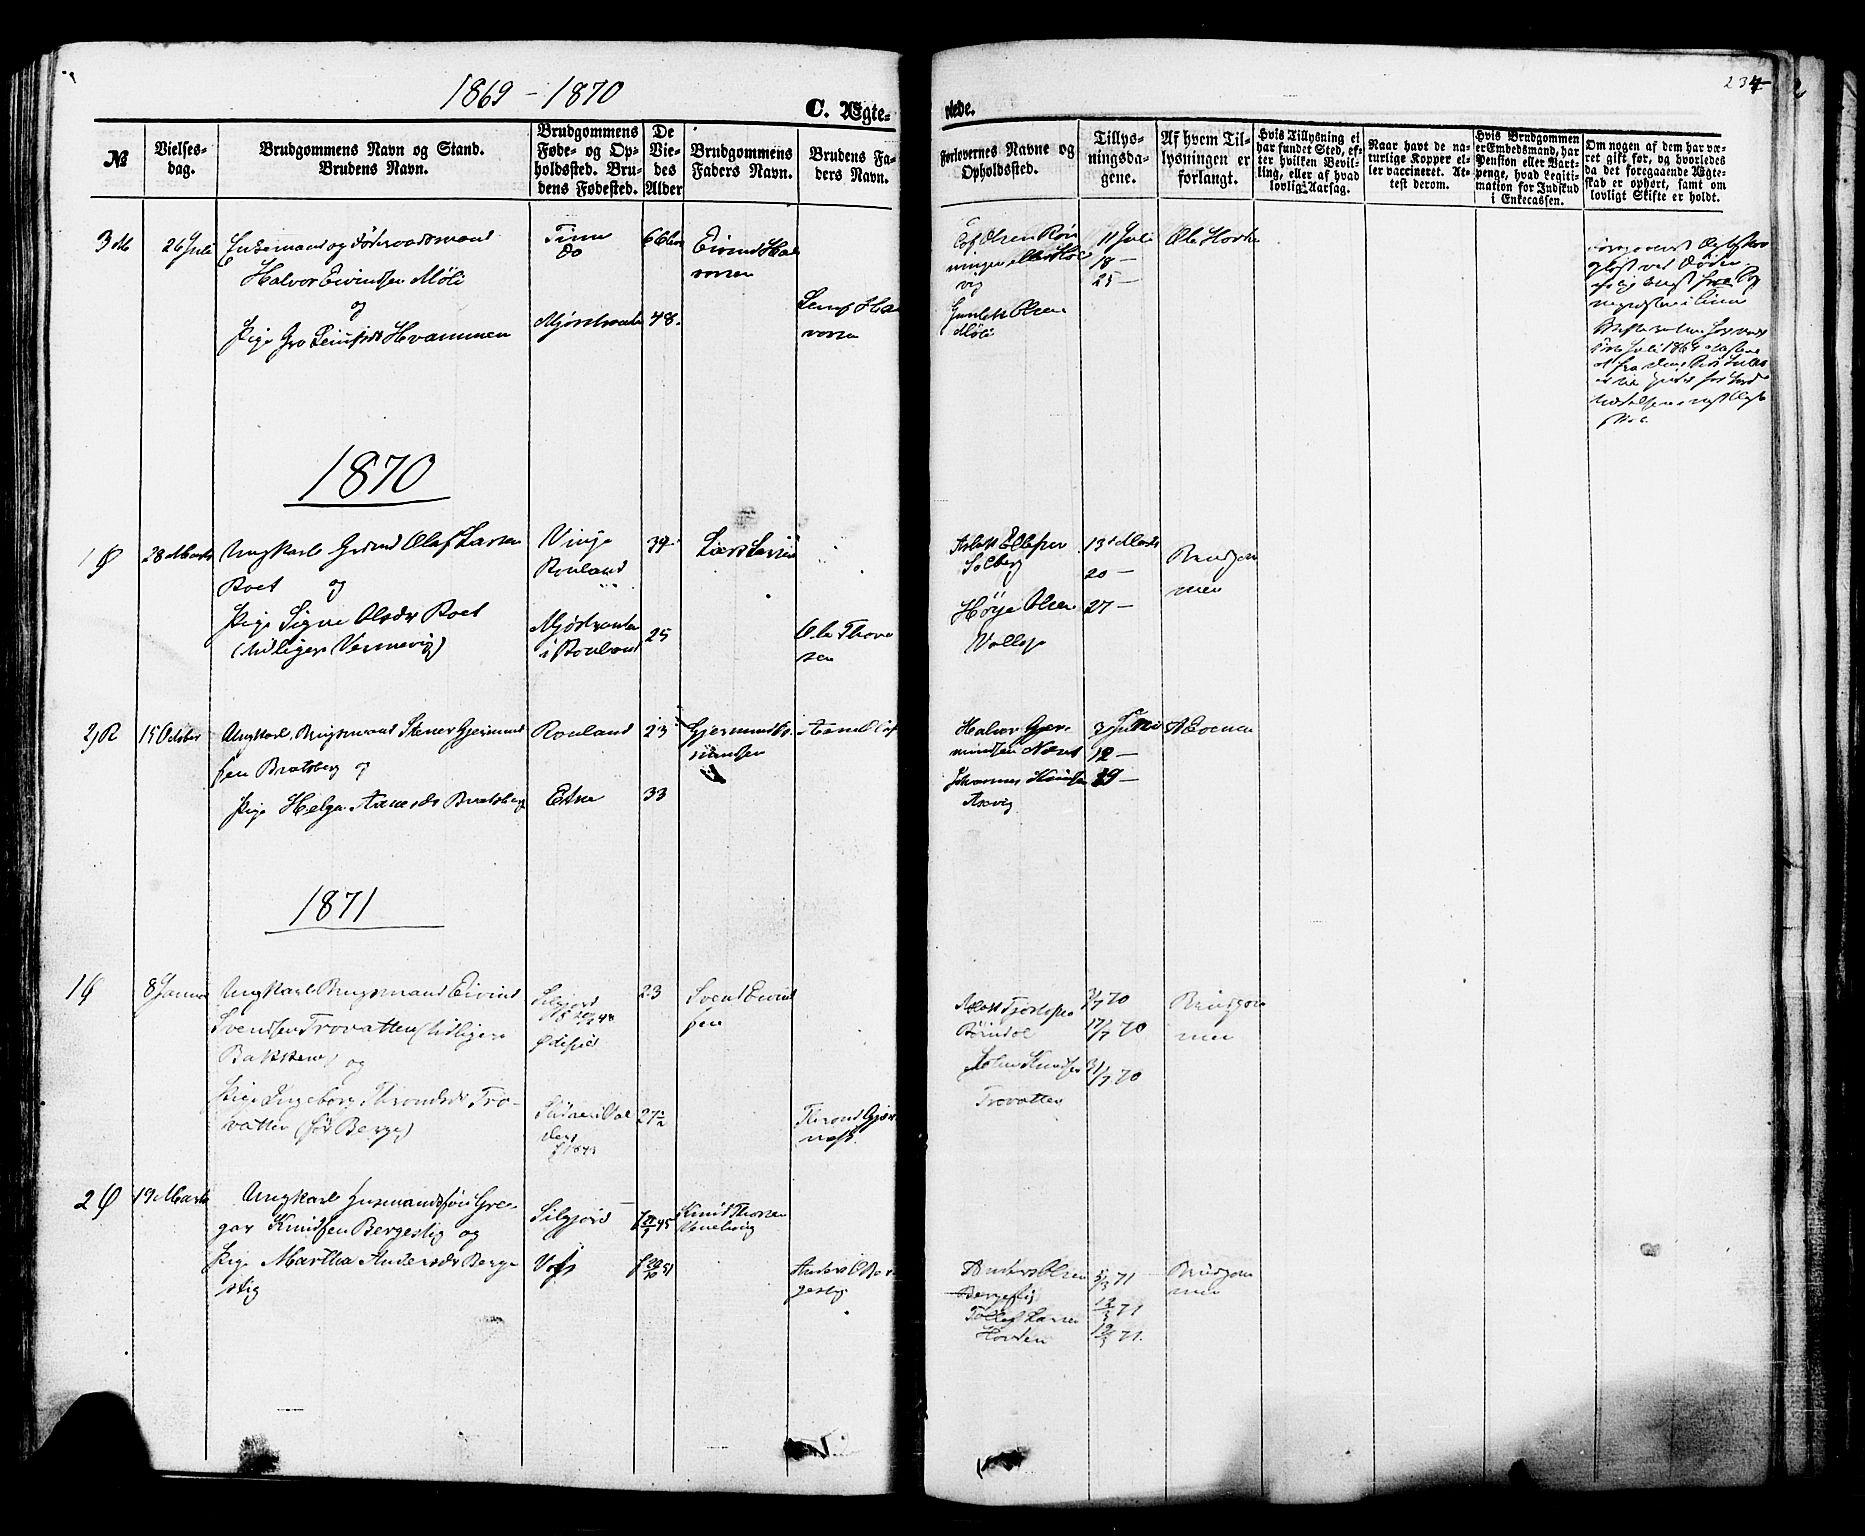 SAKO, Rauland kirkebøker, F/Fa/L0003: Ministerialbok nr. 3, 1859-1886, s. 234